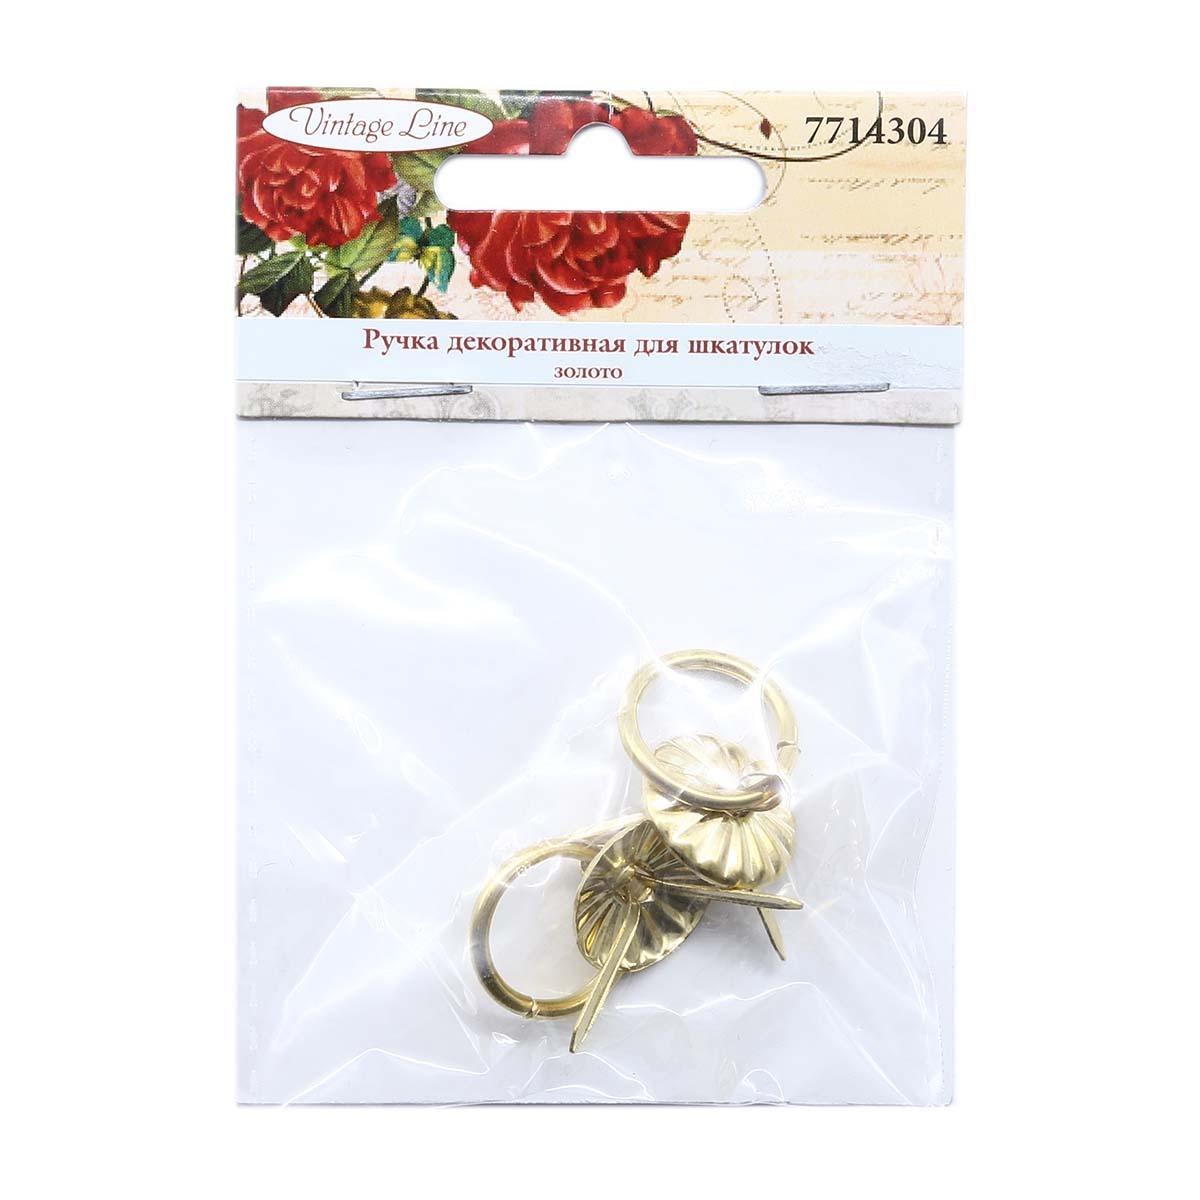 Ручка декоративная для шкатулок 17*17 мм, 2шт золото